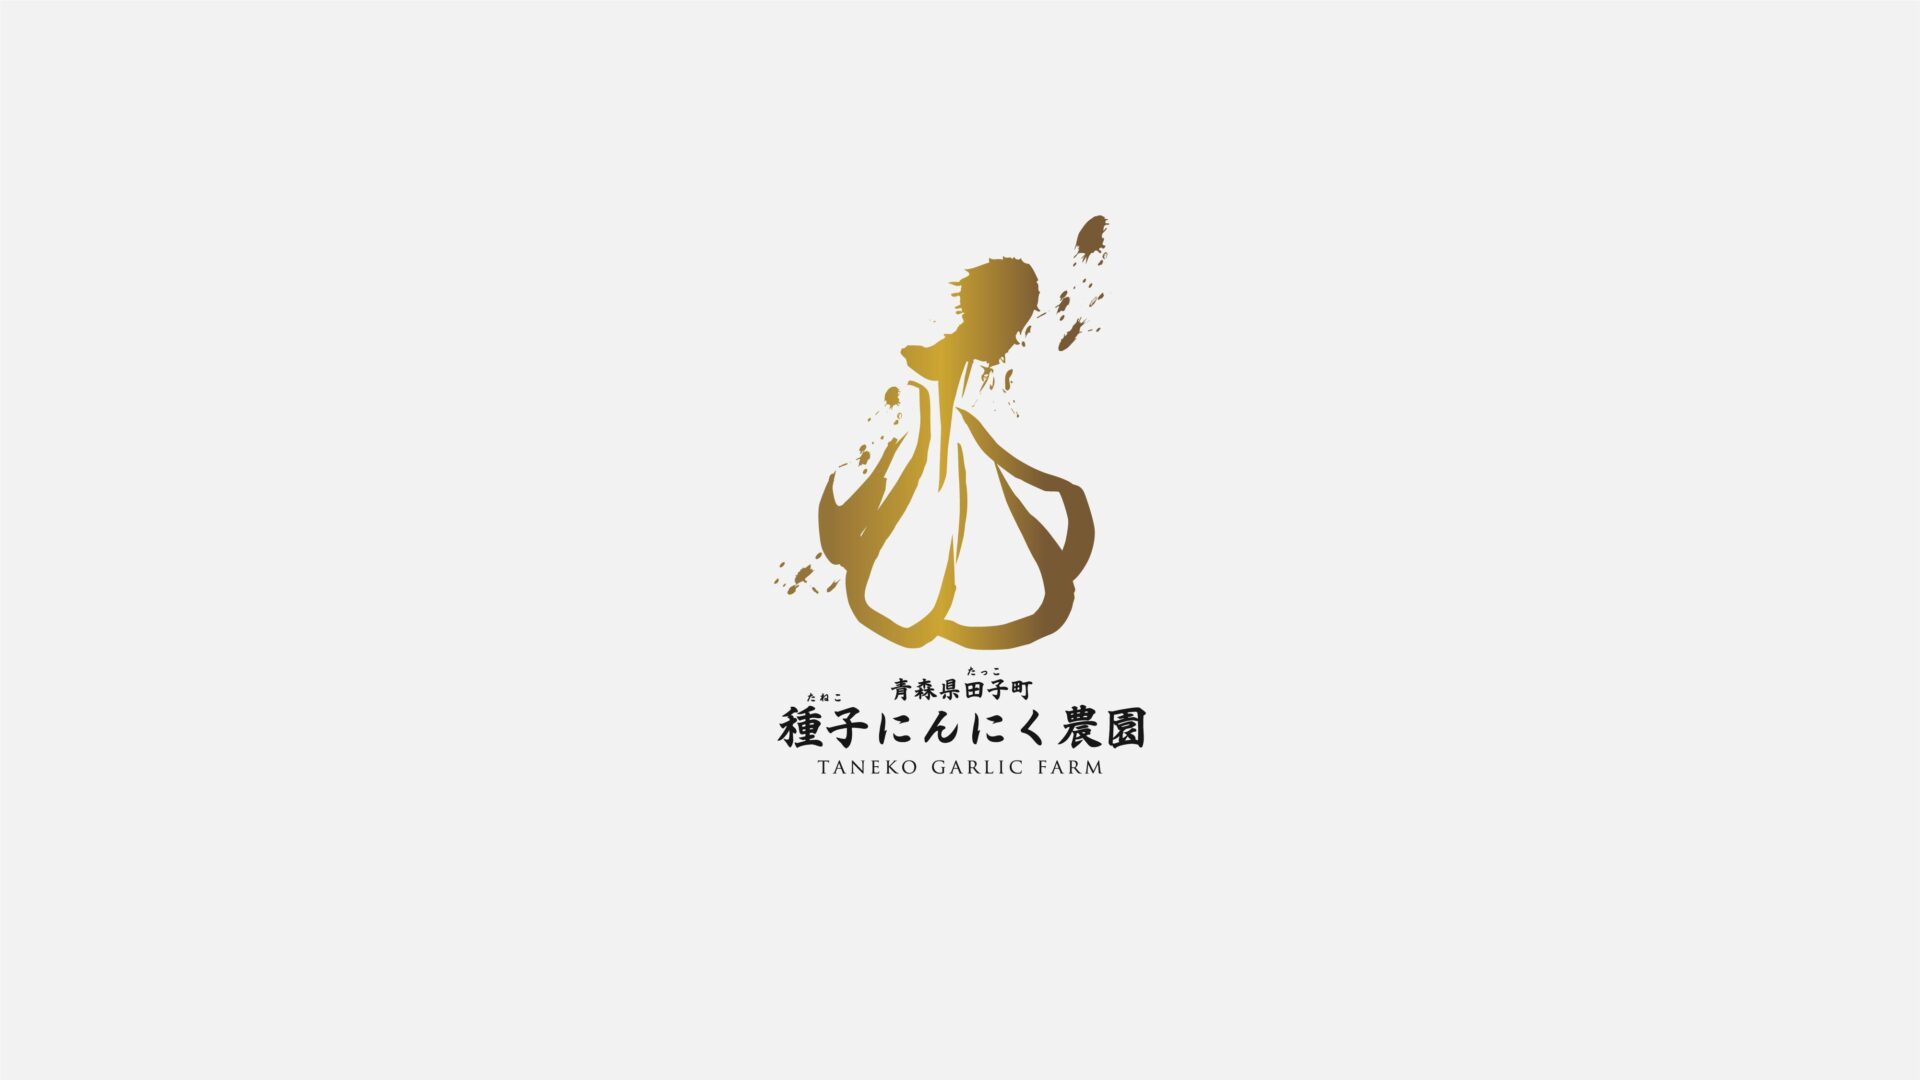 「TANEKO NINNIKU NOUEN」のサムネイル画像